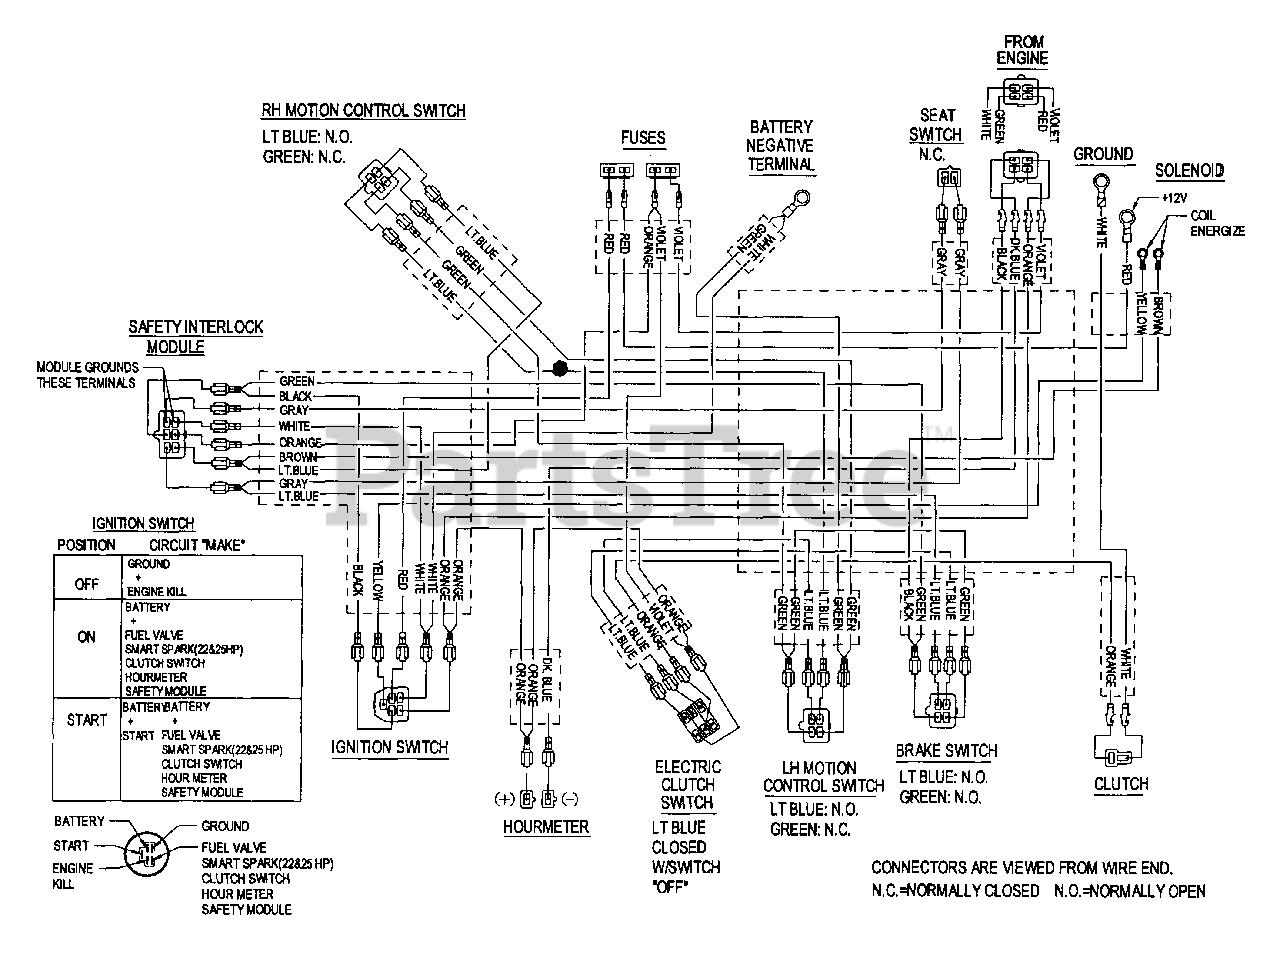 Exmark Lz22kc603 Exmark 60 Lazer Z Zero Turn Mower 22hp Kohler Sn 150000 189999 1998 Electrical Diagram Parts Lookup With Diagrams Partstree